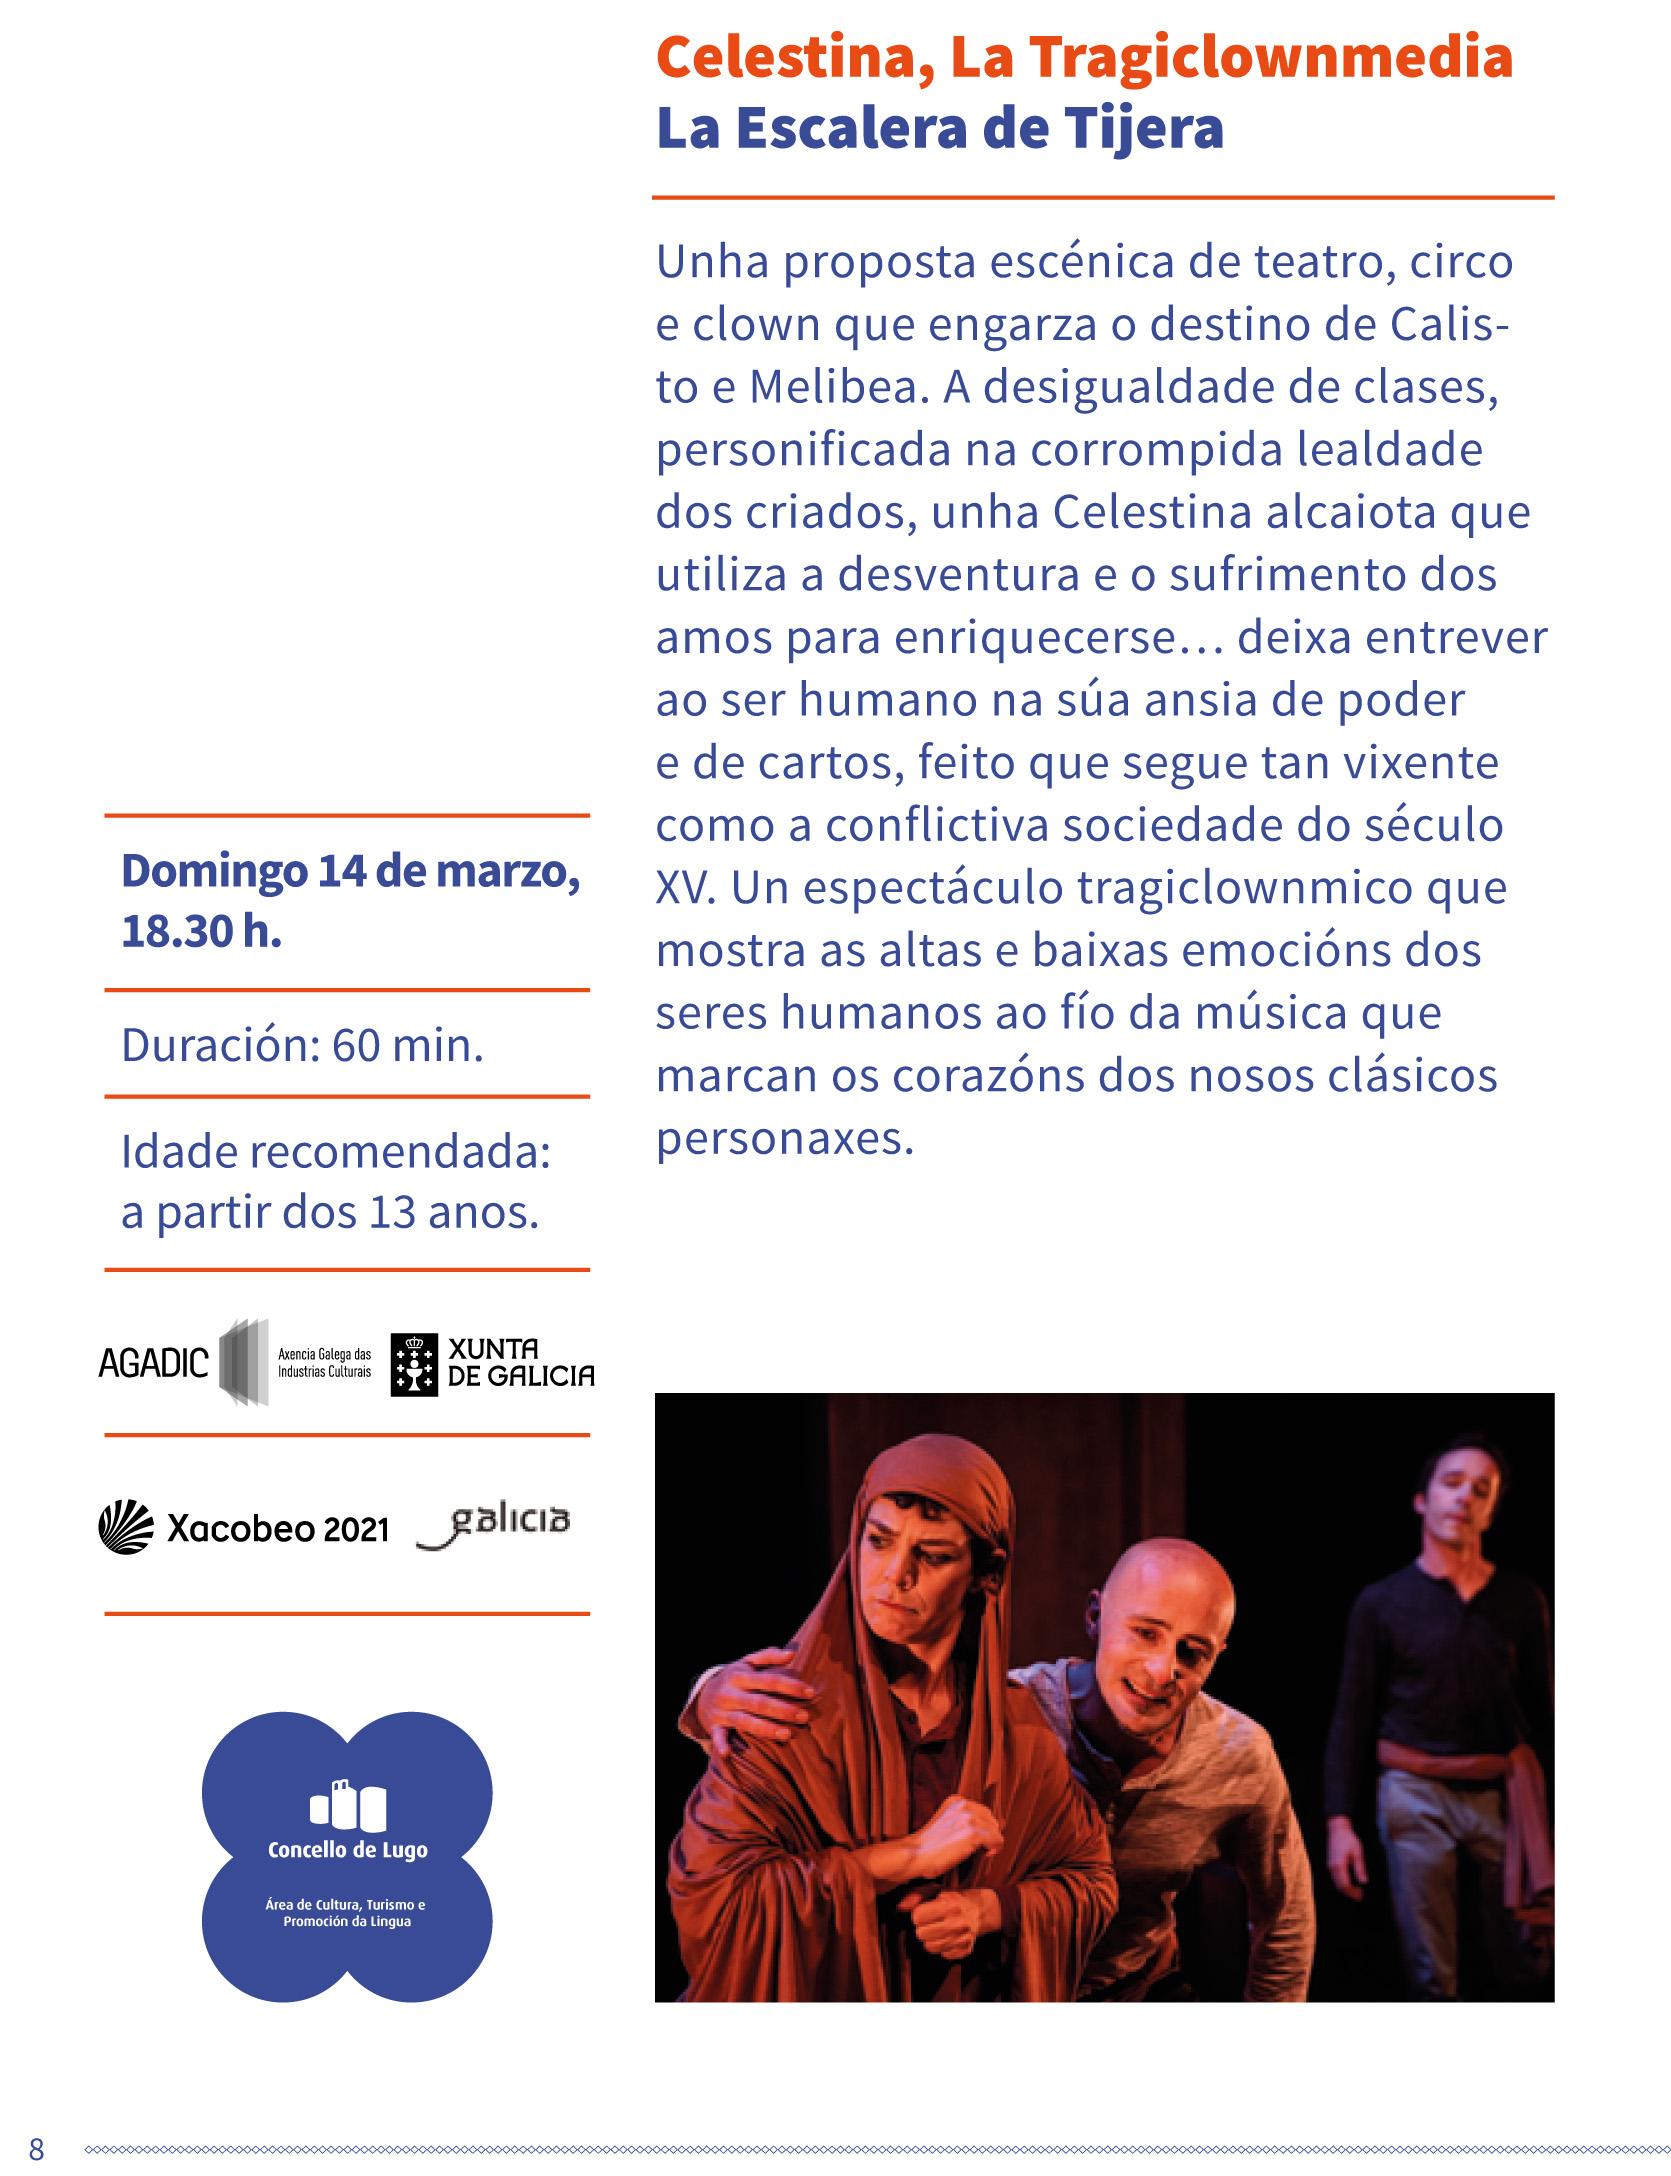 Teatro clásico - Celestina la tragiclownmedia